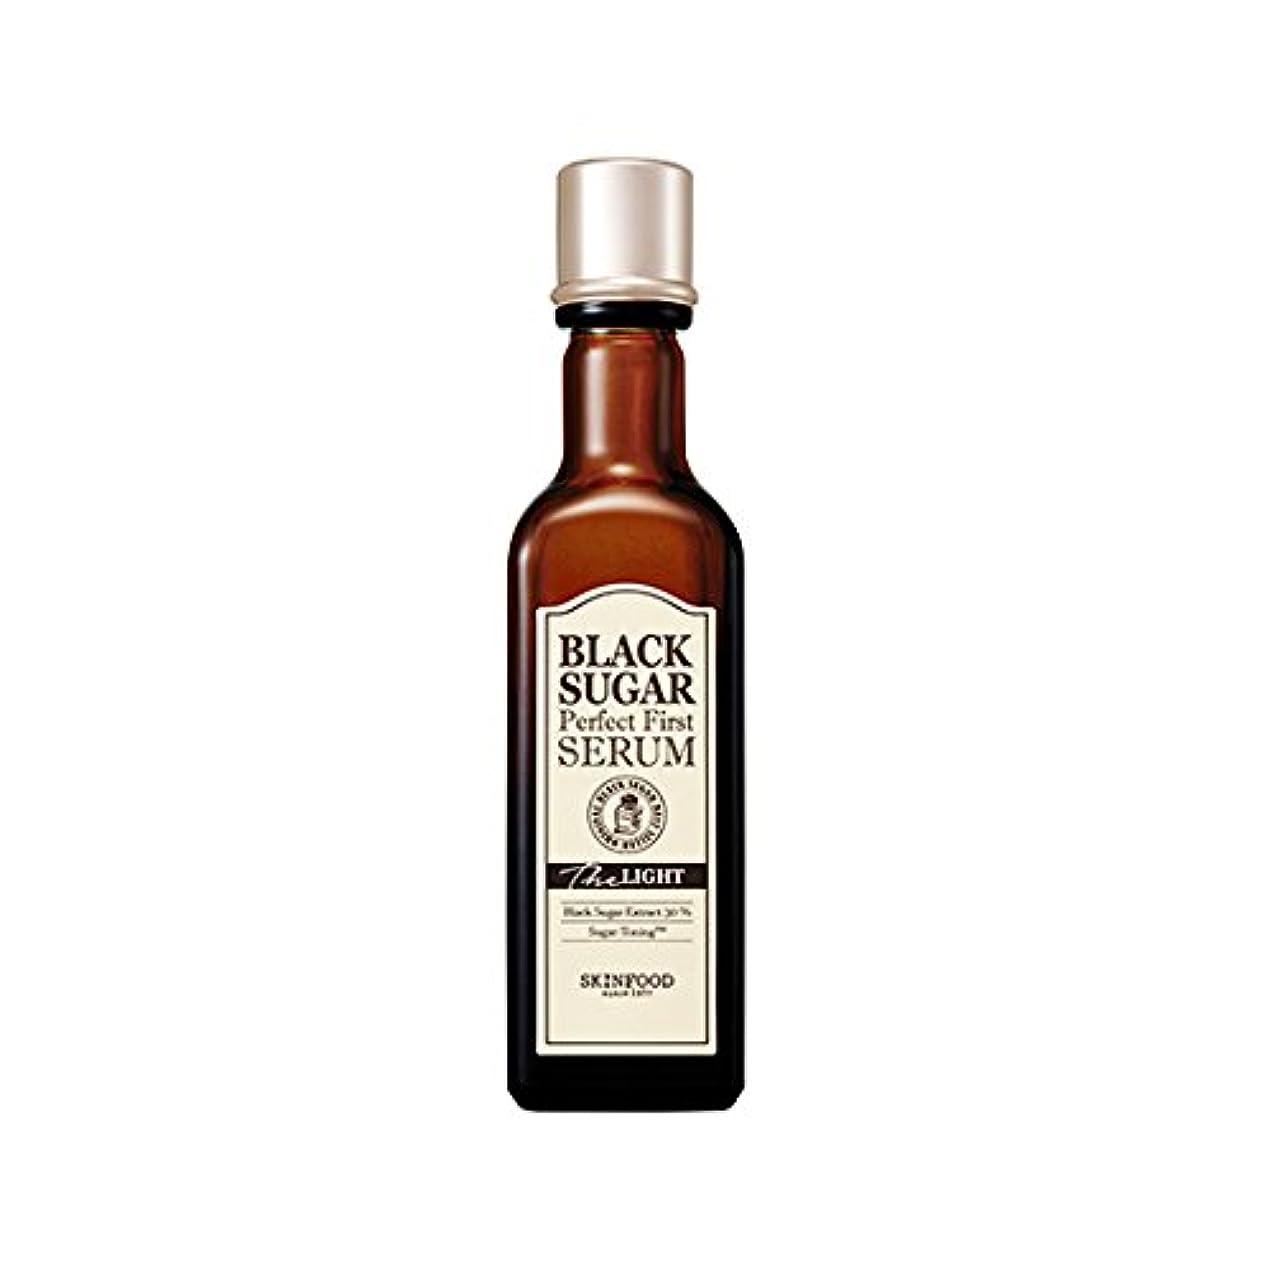 品防腐剤祖母Skinfood black sugar perfect first serum the light/黒糖完全最初血清ライト/120ml + 60? [並行輸入品]